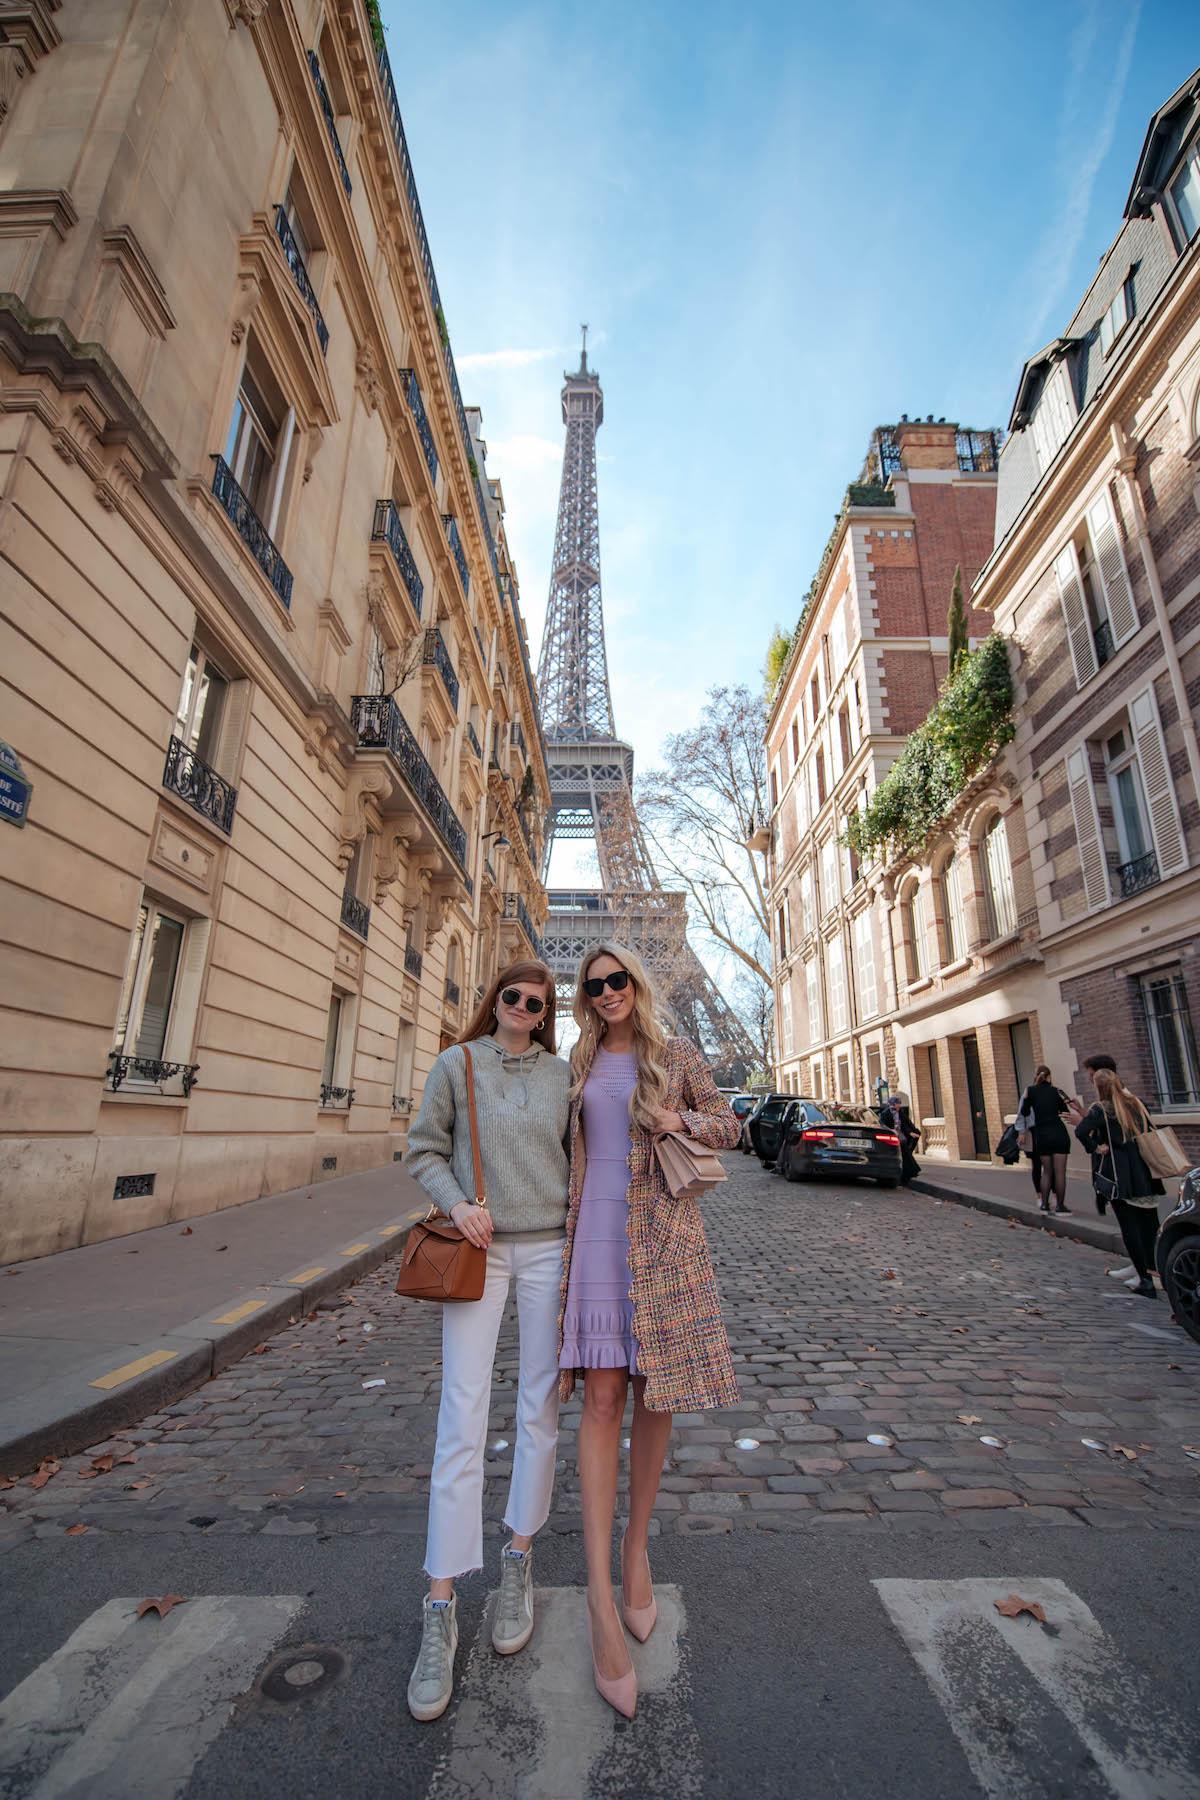 Eiffel Tower Rue de la Universidad